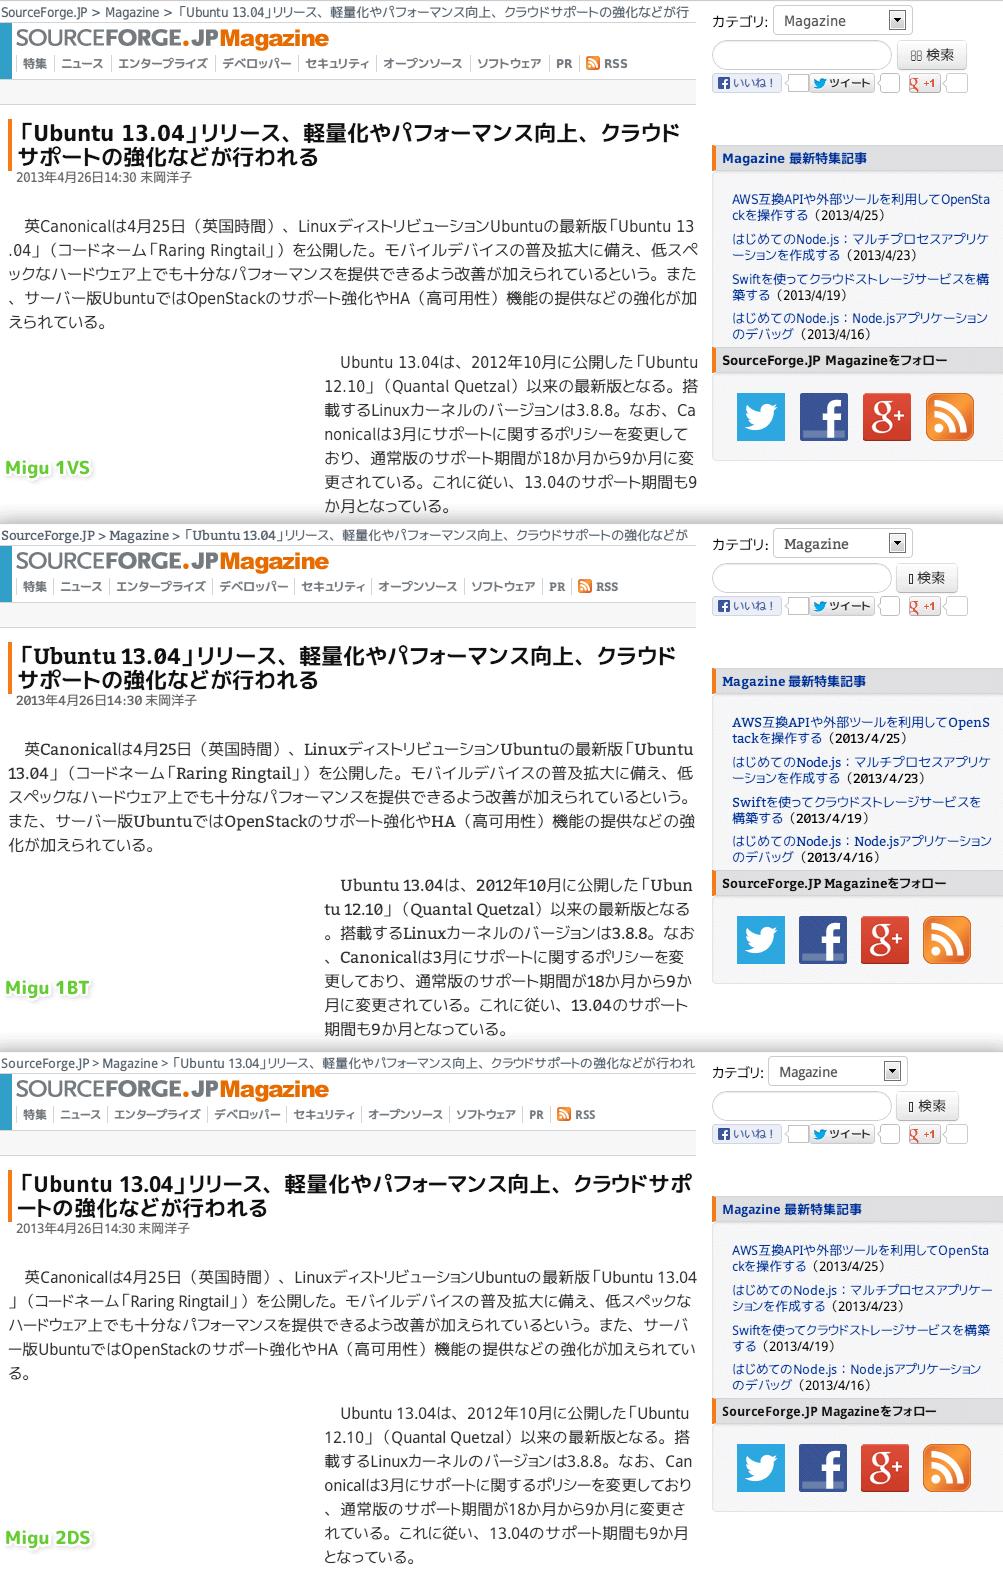 f:id:itouhiro:20130428182839p:image